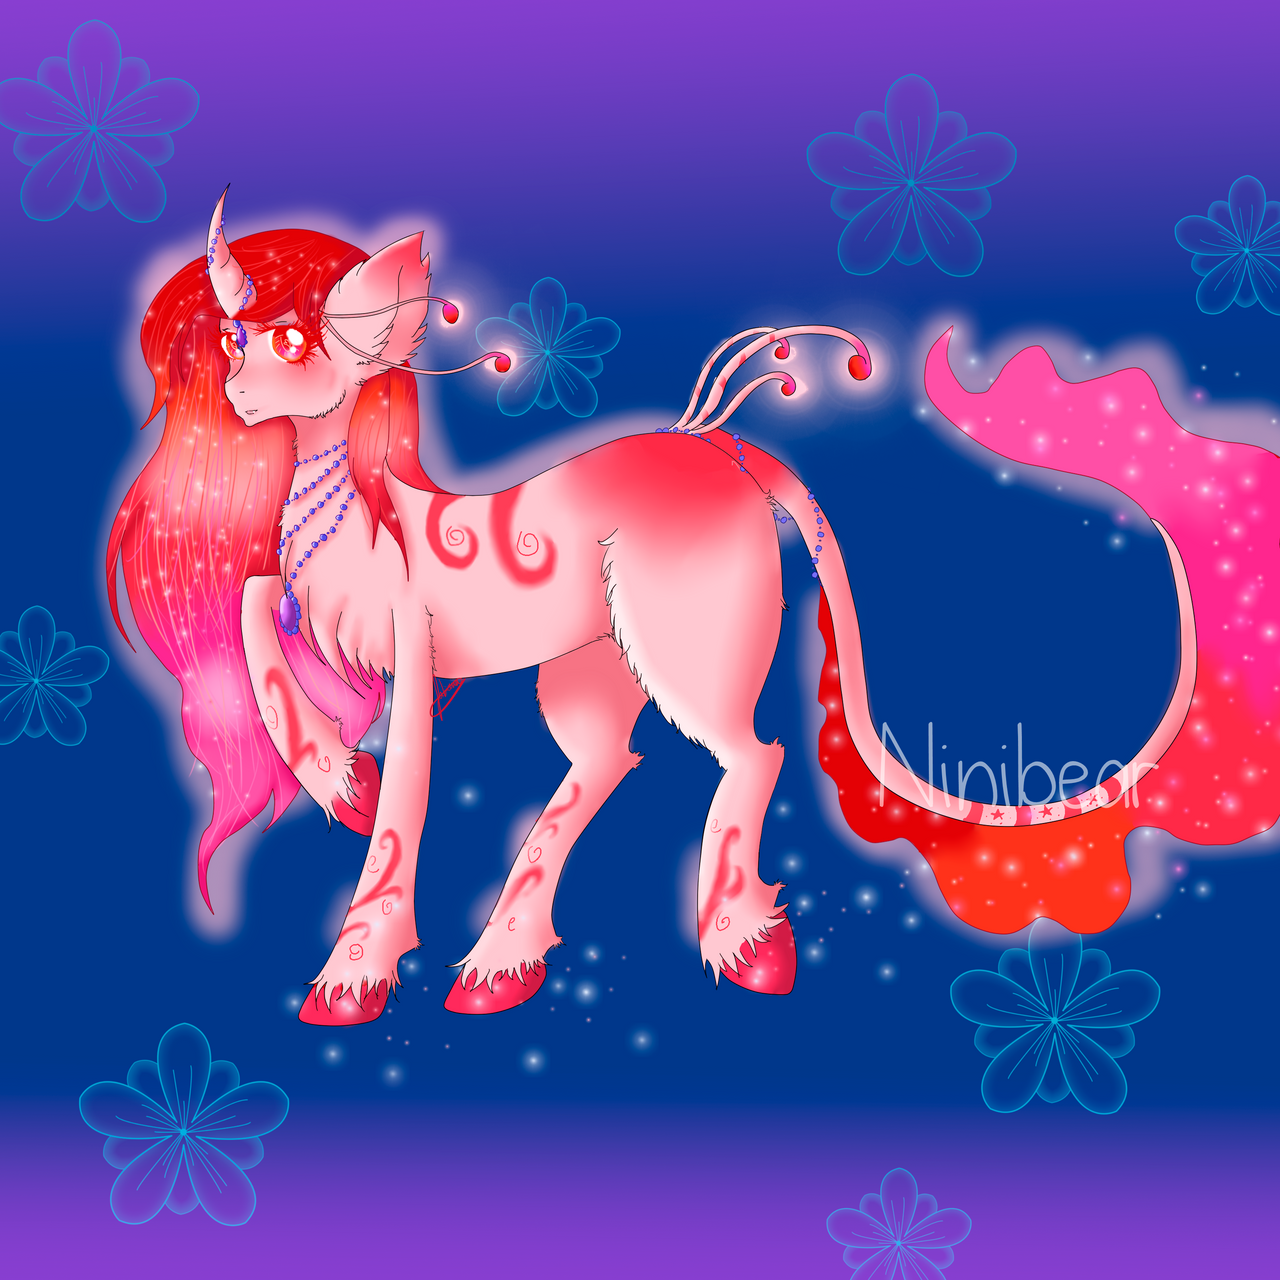 legendary_sparkler__adoptable__by_fabicakes13-d9ysv9o.png